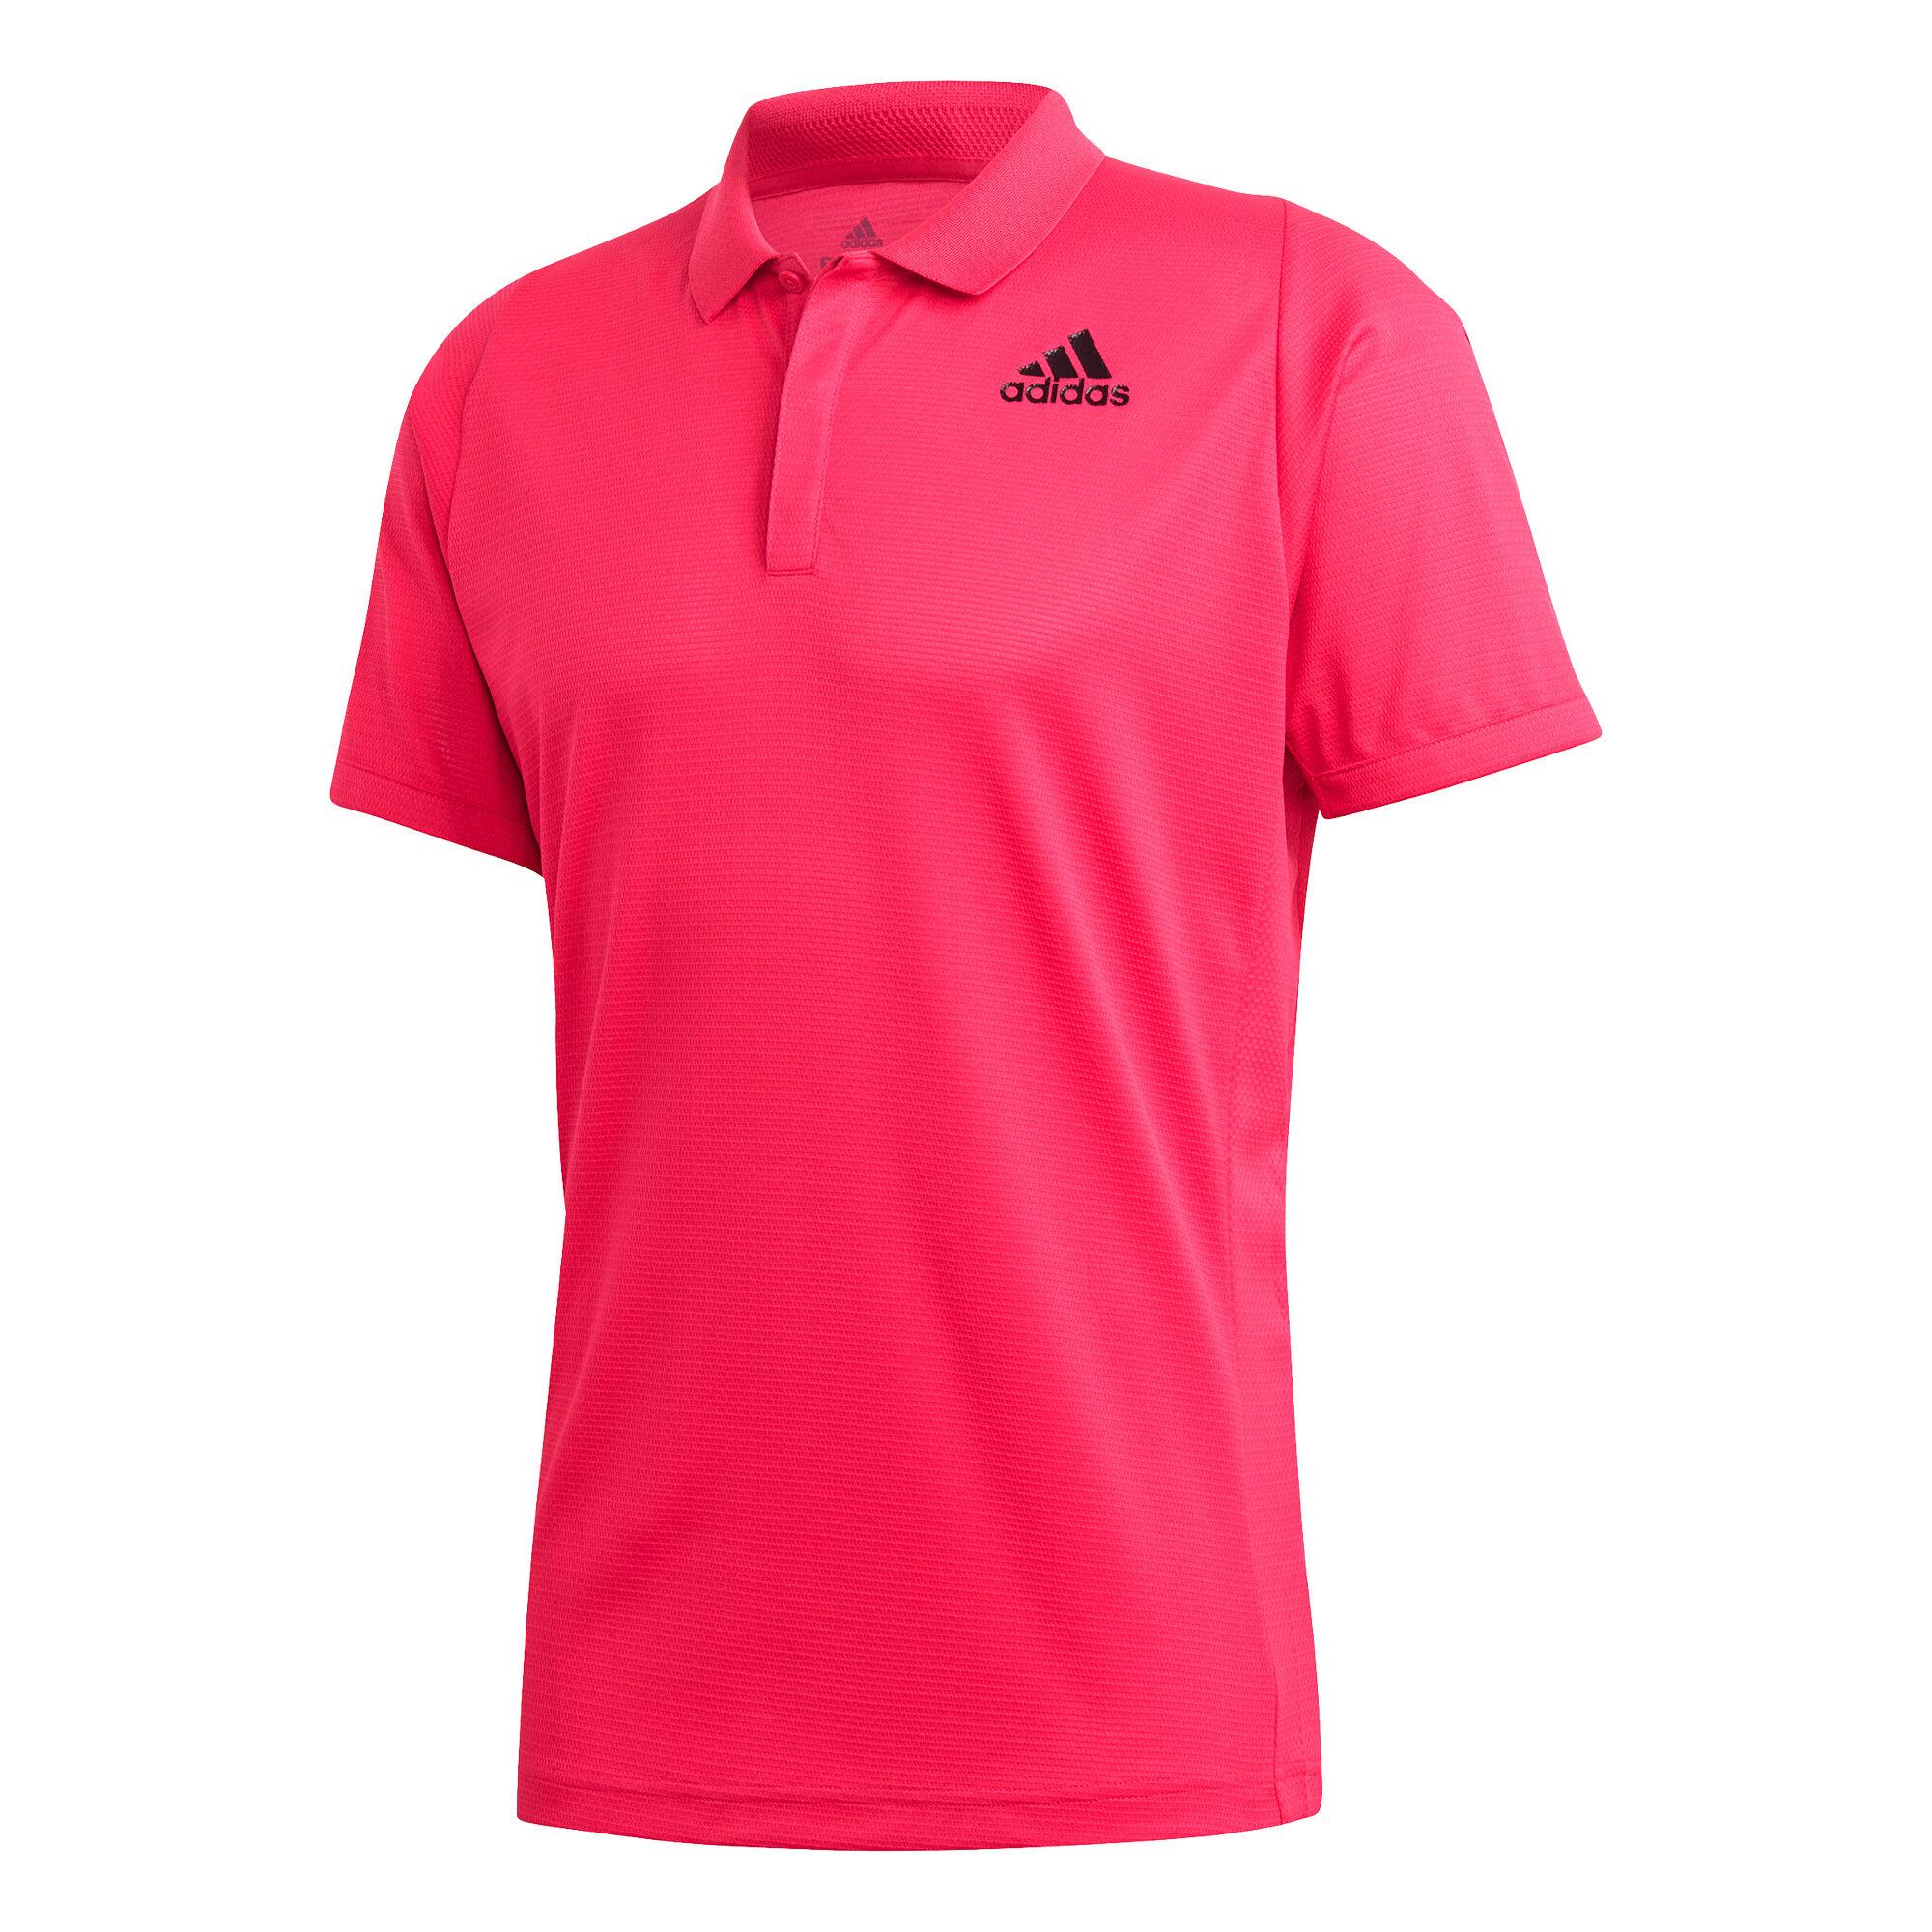 adidas Freelift Heat Ready Polo Herren Pink, Schwarz